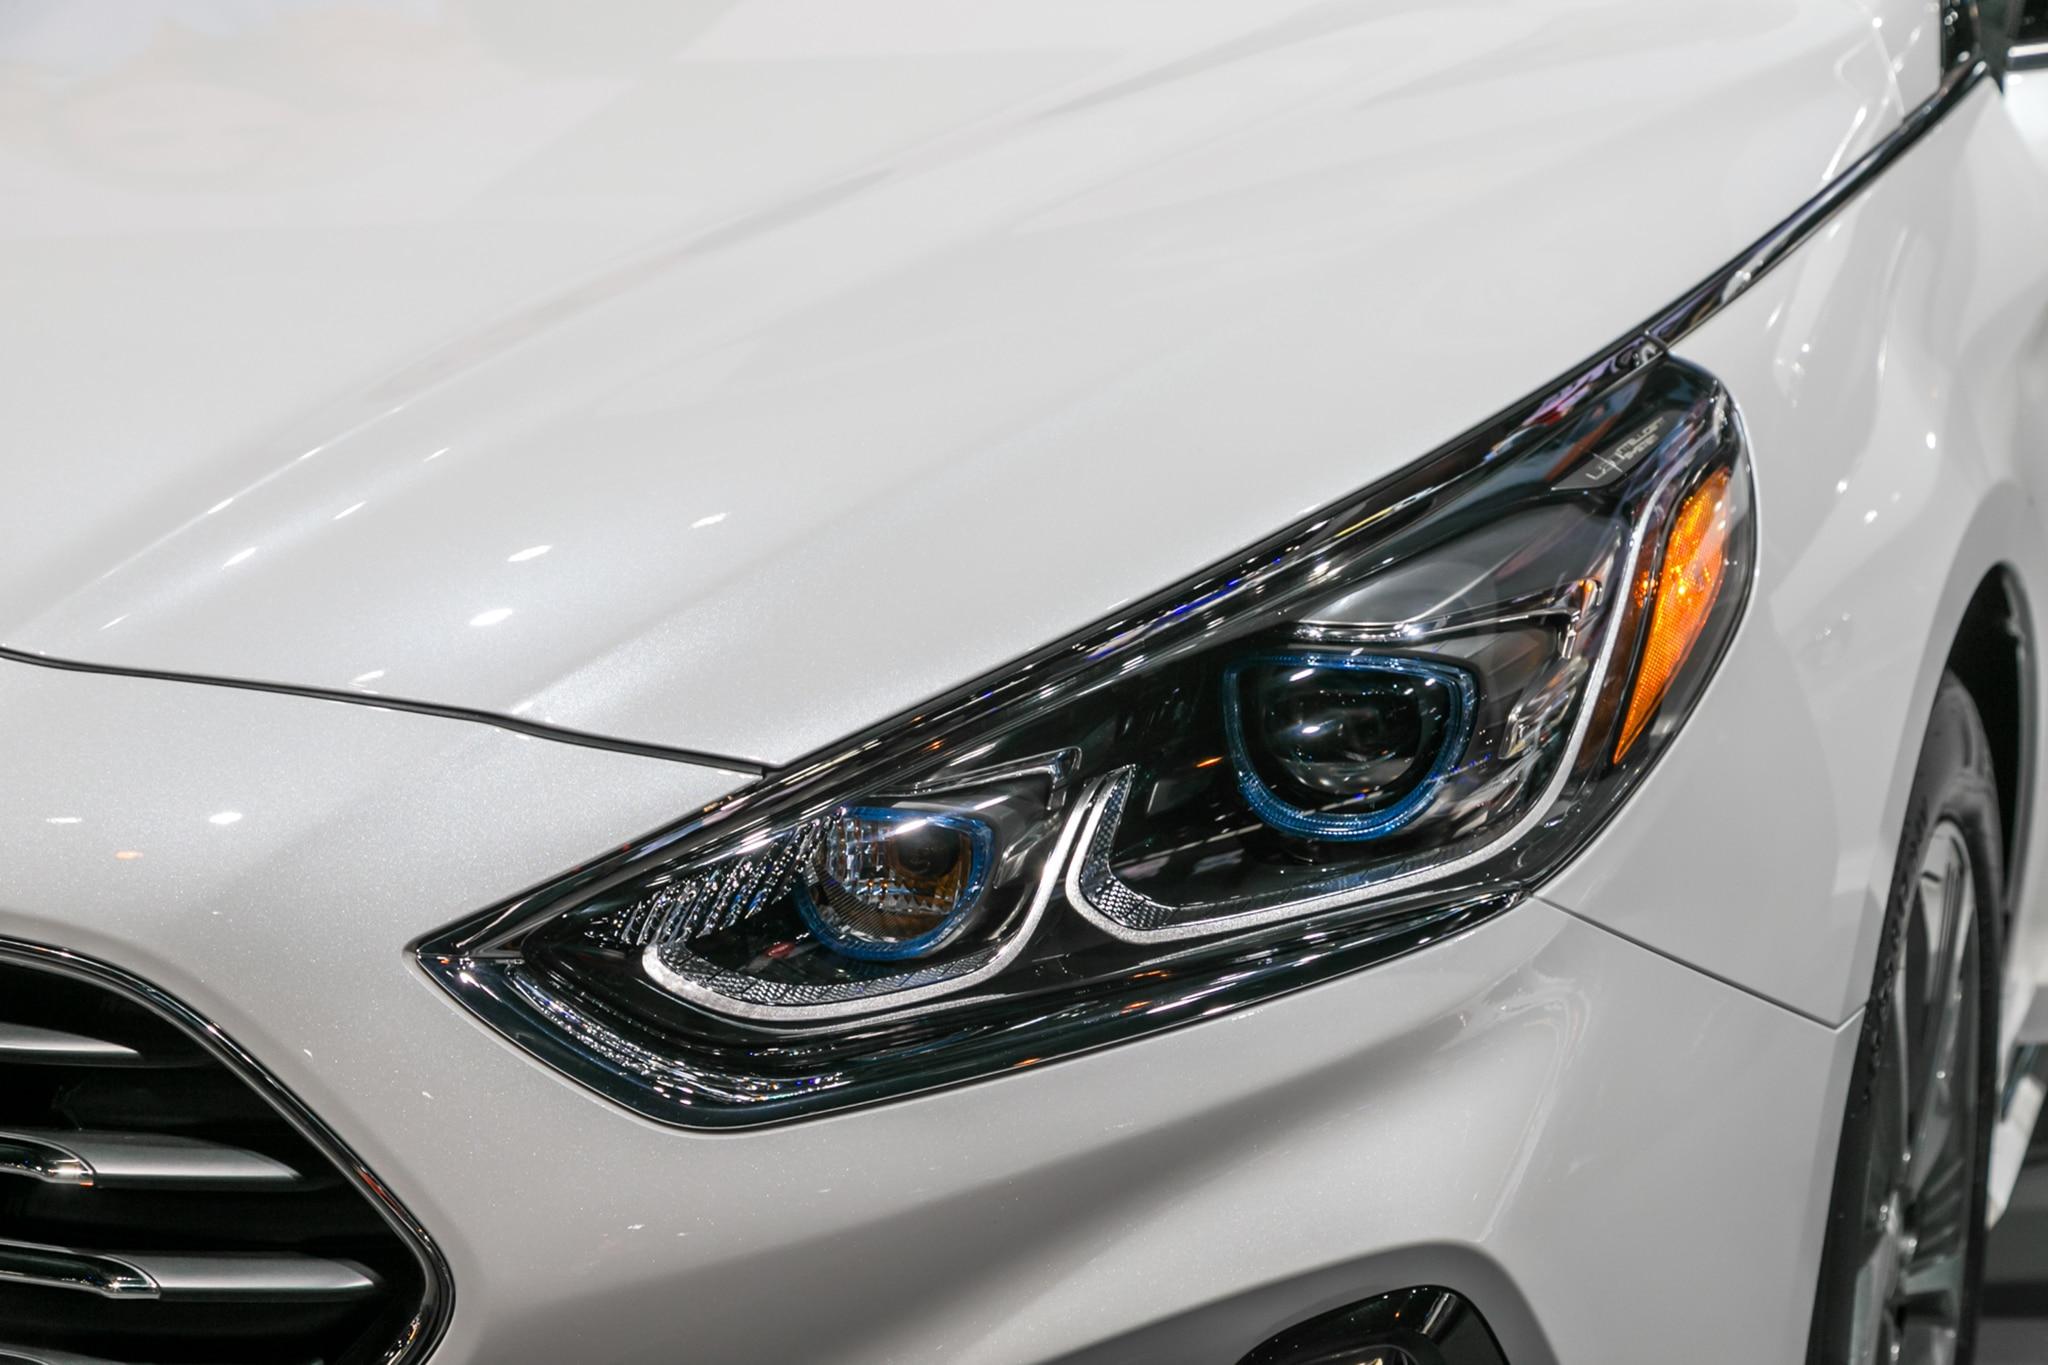 2018 Hyundai Sonata Hybrid Headlamp 8 Febrero Miguel Cortina